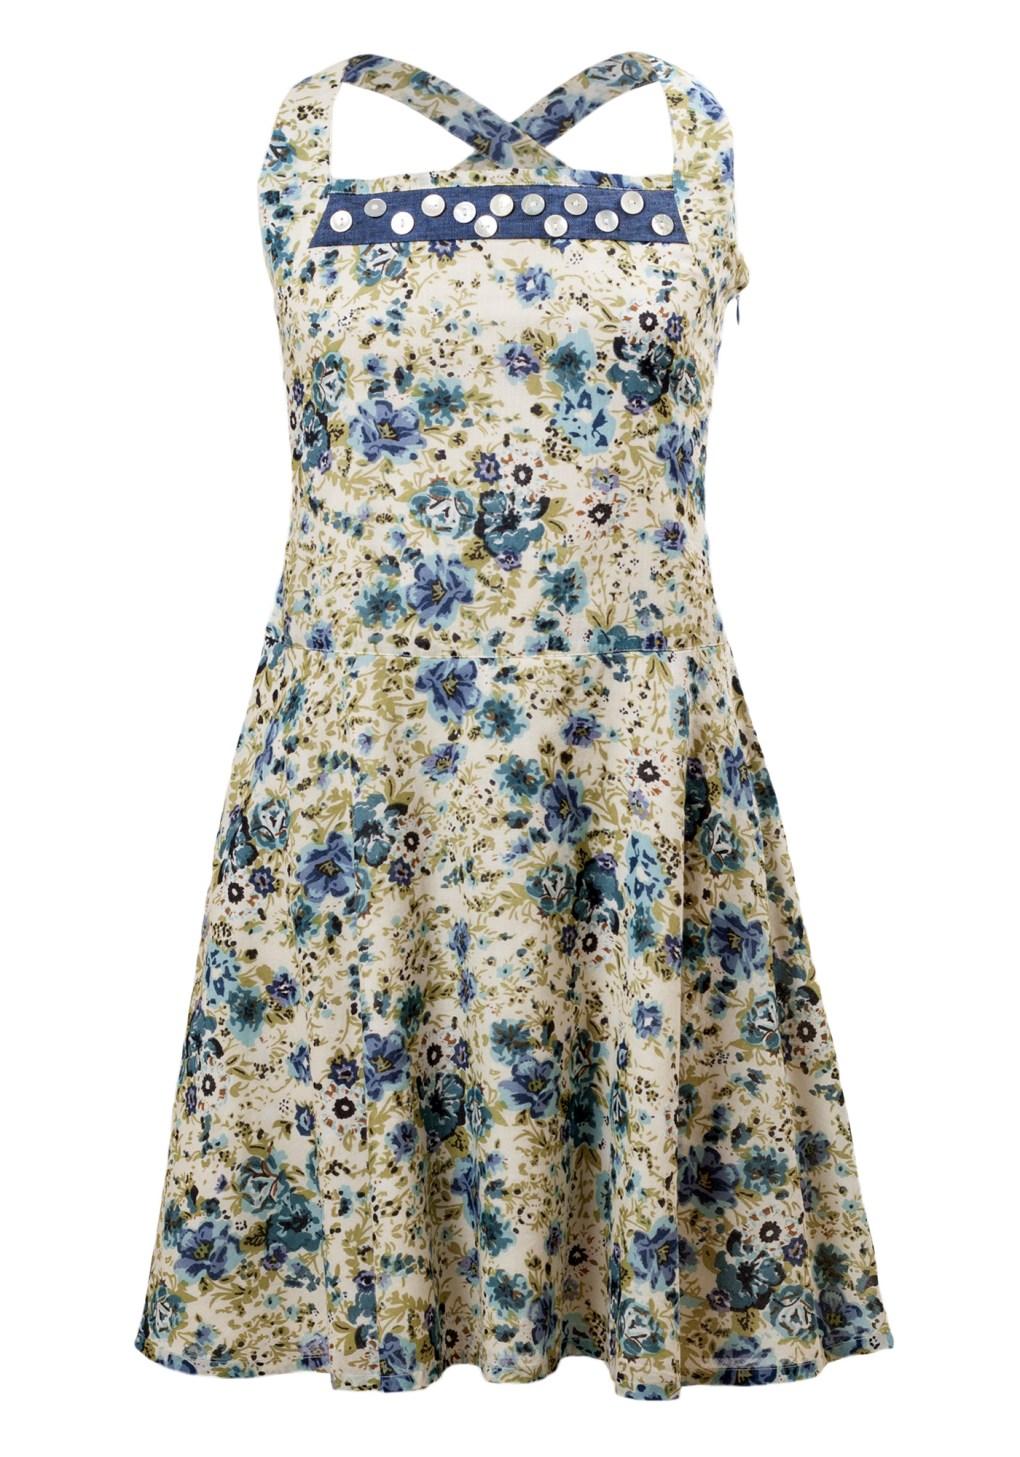 MINC Petite Girls Halter Dress in Floral Printed Cotton